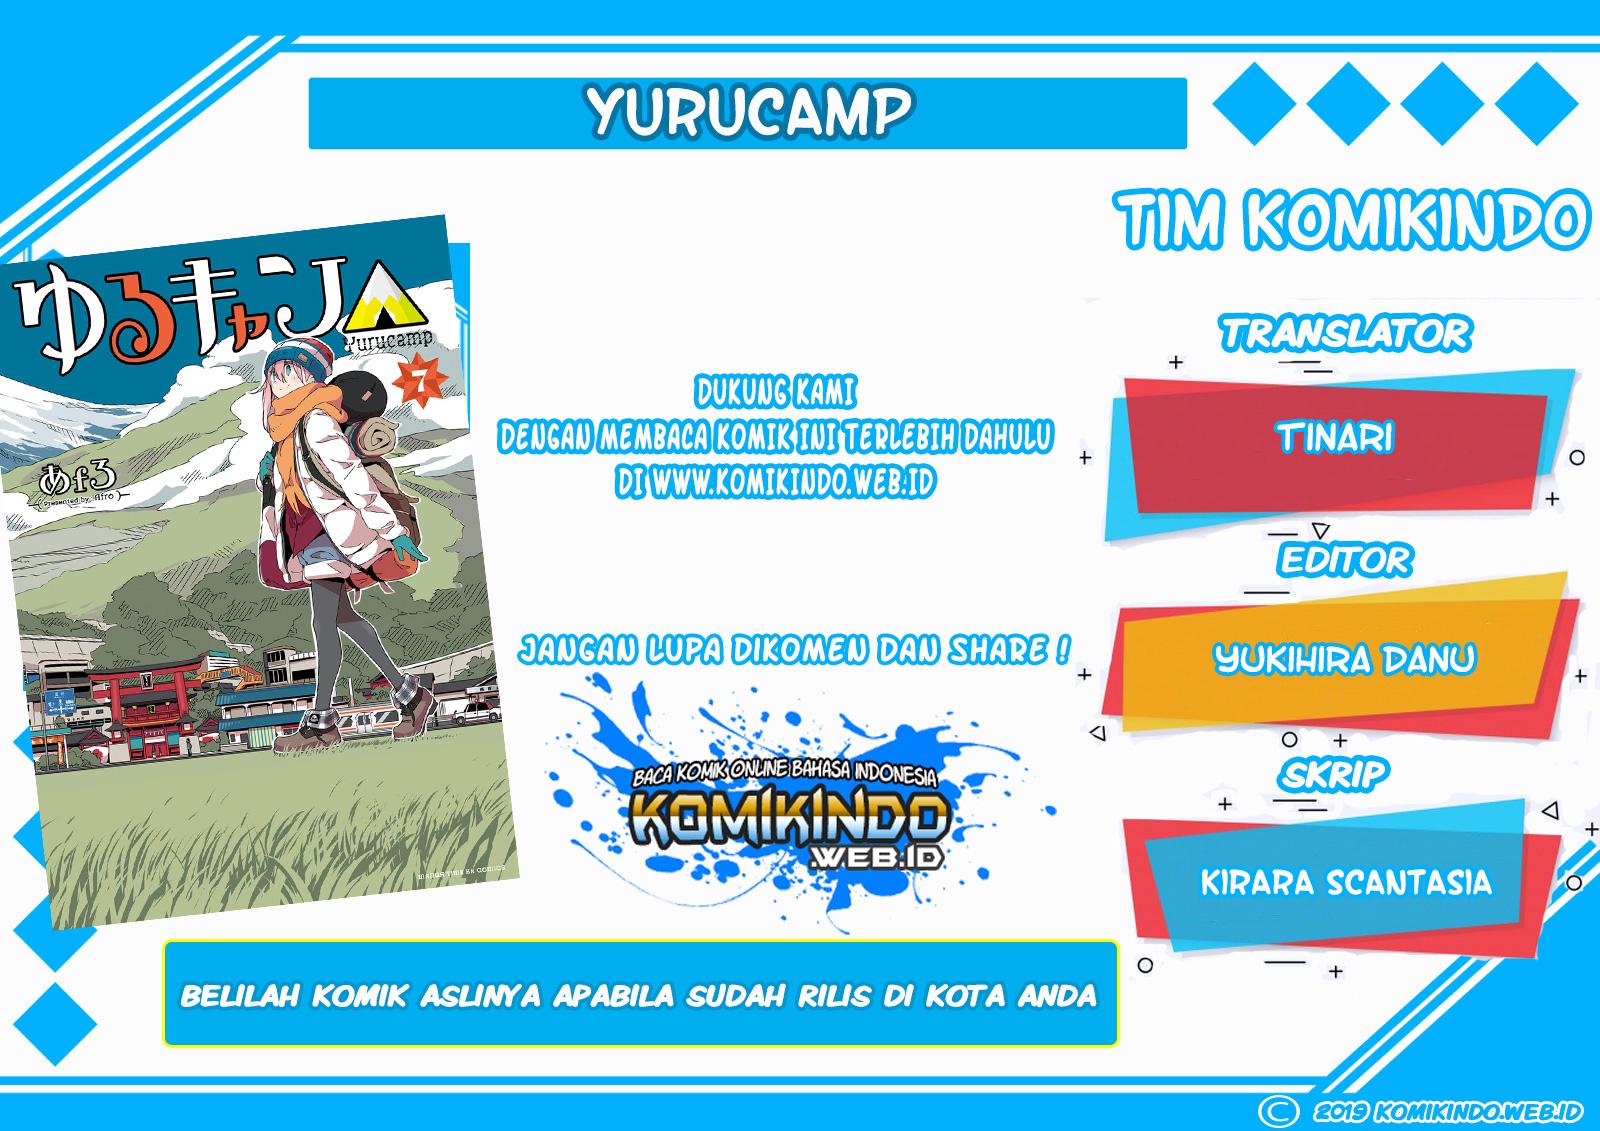 Dilarang COPAS - situs resmi www.mangacanblog.com - Komik yuru camp 013 - chapter 13 14 Indonesia yuru camp 013 - chapter 13 Terbaru |Baca Manga Komik Indonesia|Mangacan